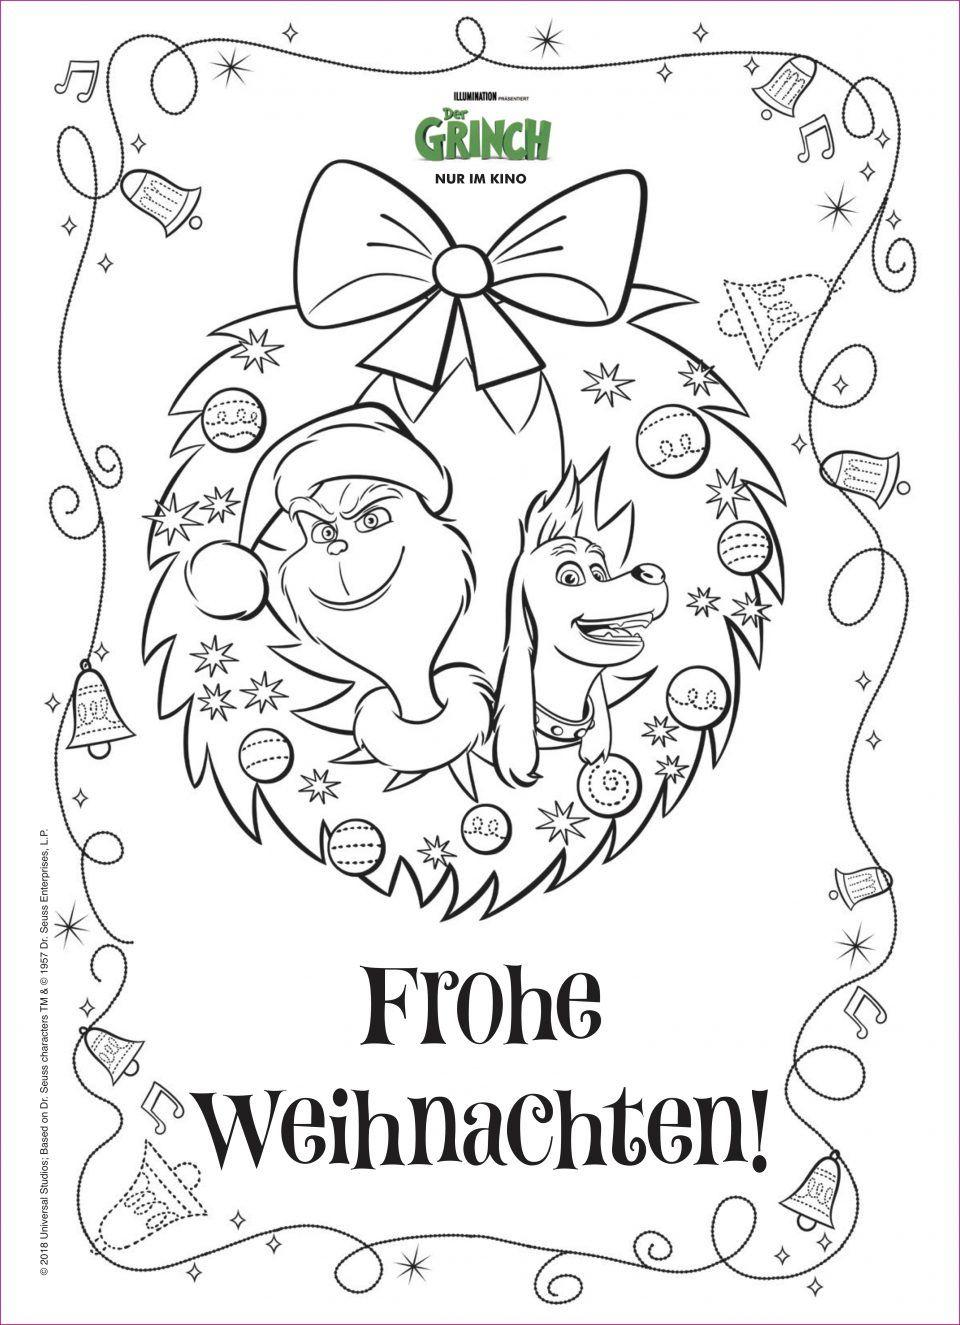 Grinch Unicorn Coloring Pages Kindergarten Worksheets Grinch